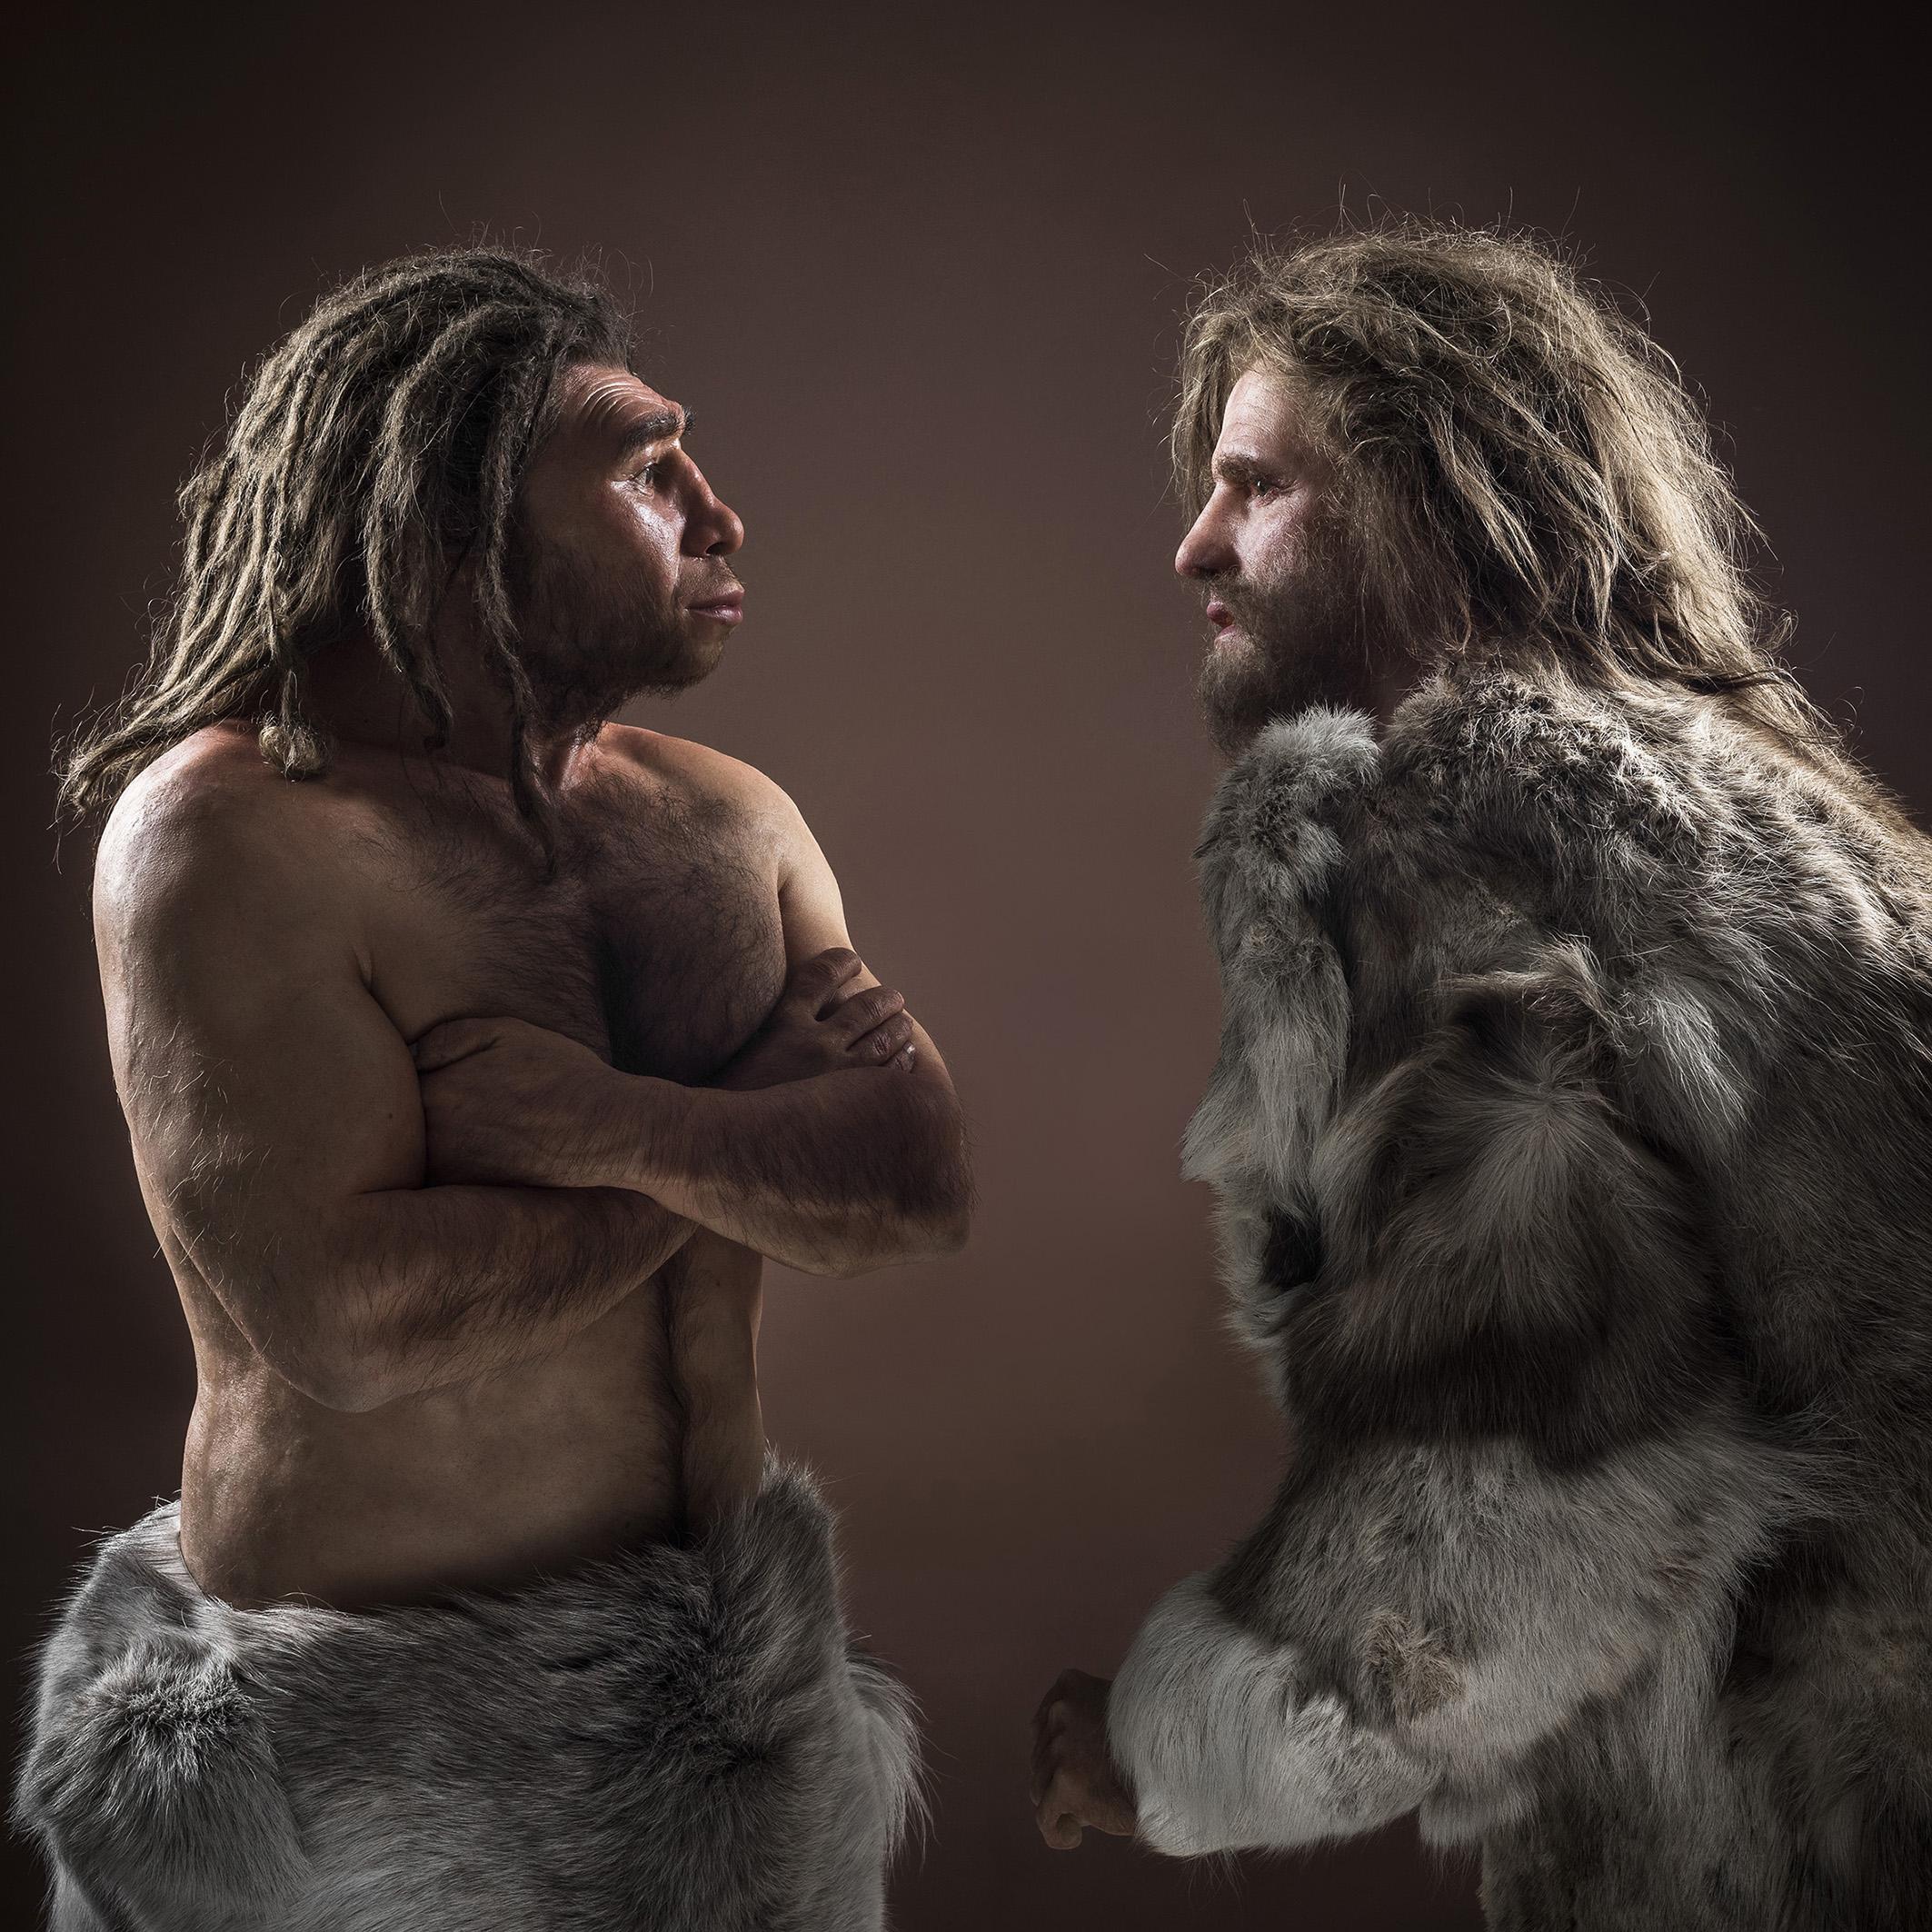 Bilddatei: Neanderthaler+HomoSapiens_DSC5443-2-kl(c)LWL,Steinweg.jpg